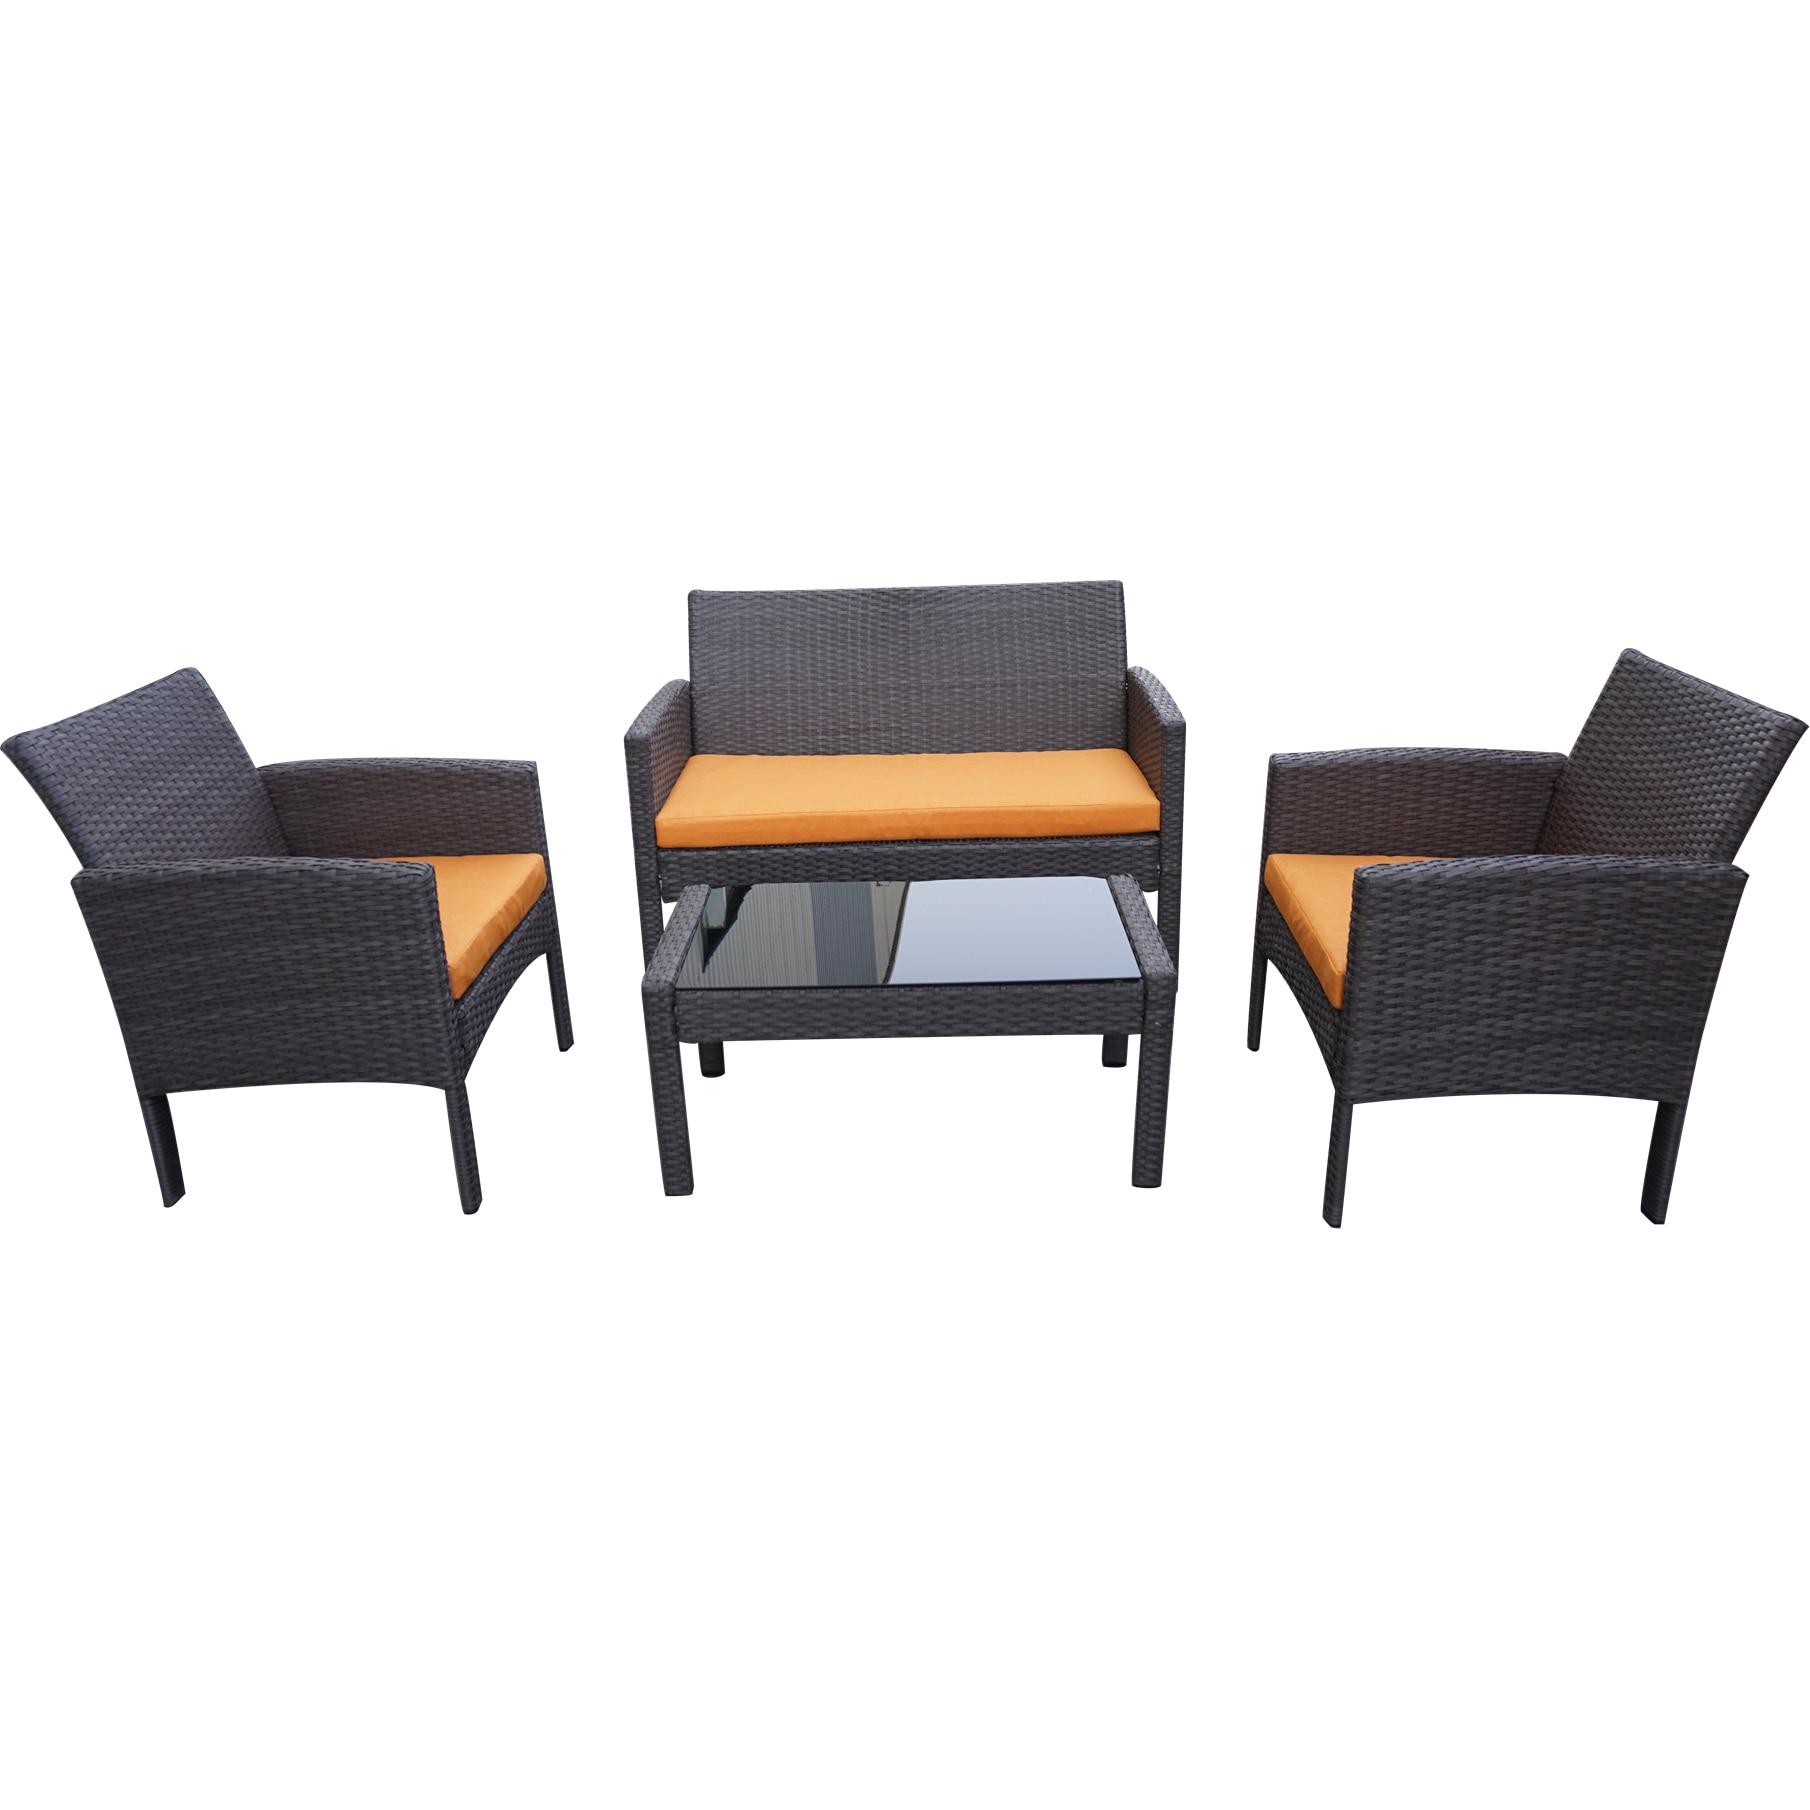 Fotografie Set mobilier gradina/terasa Kring Bahamas, masa, canapea, 2 fotolii, portocaliu